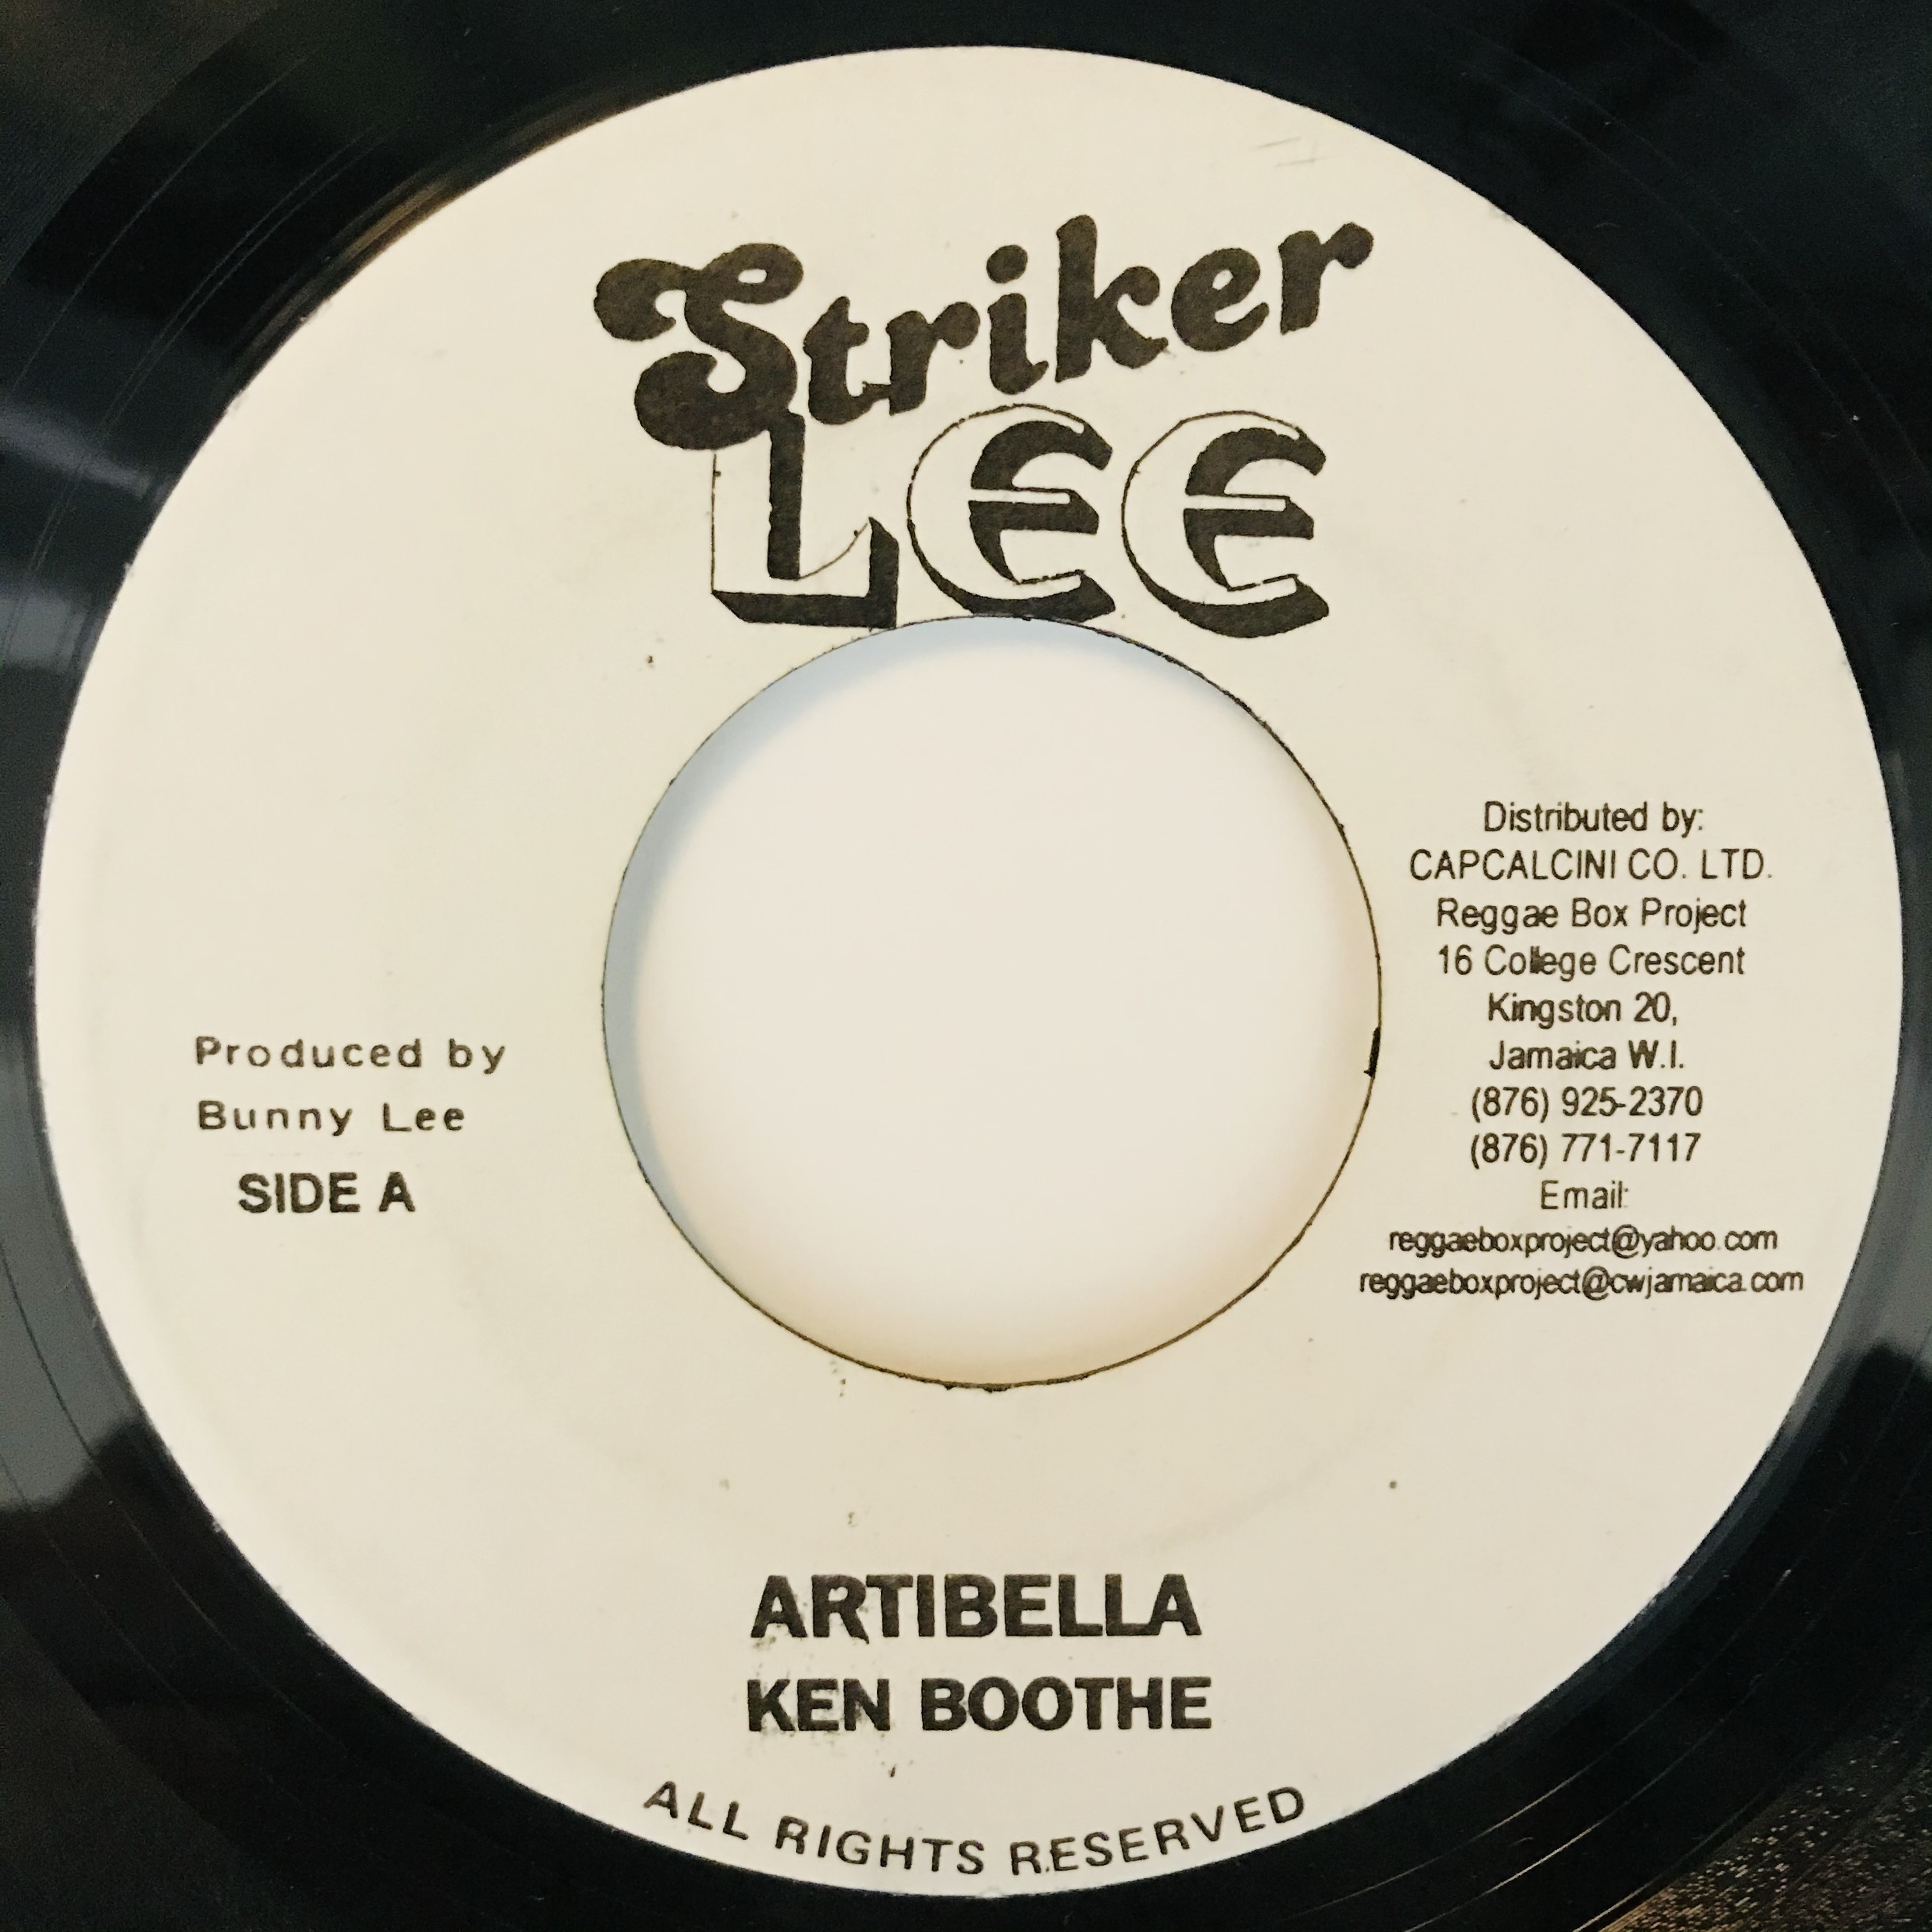 Ken Boothe - Artibella【7-11042】